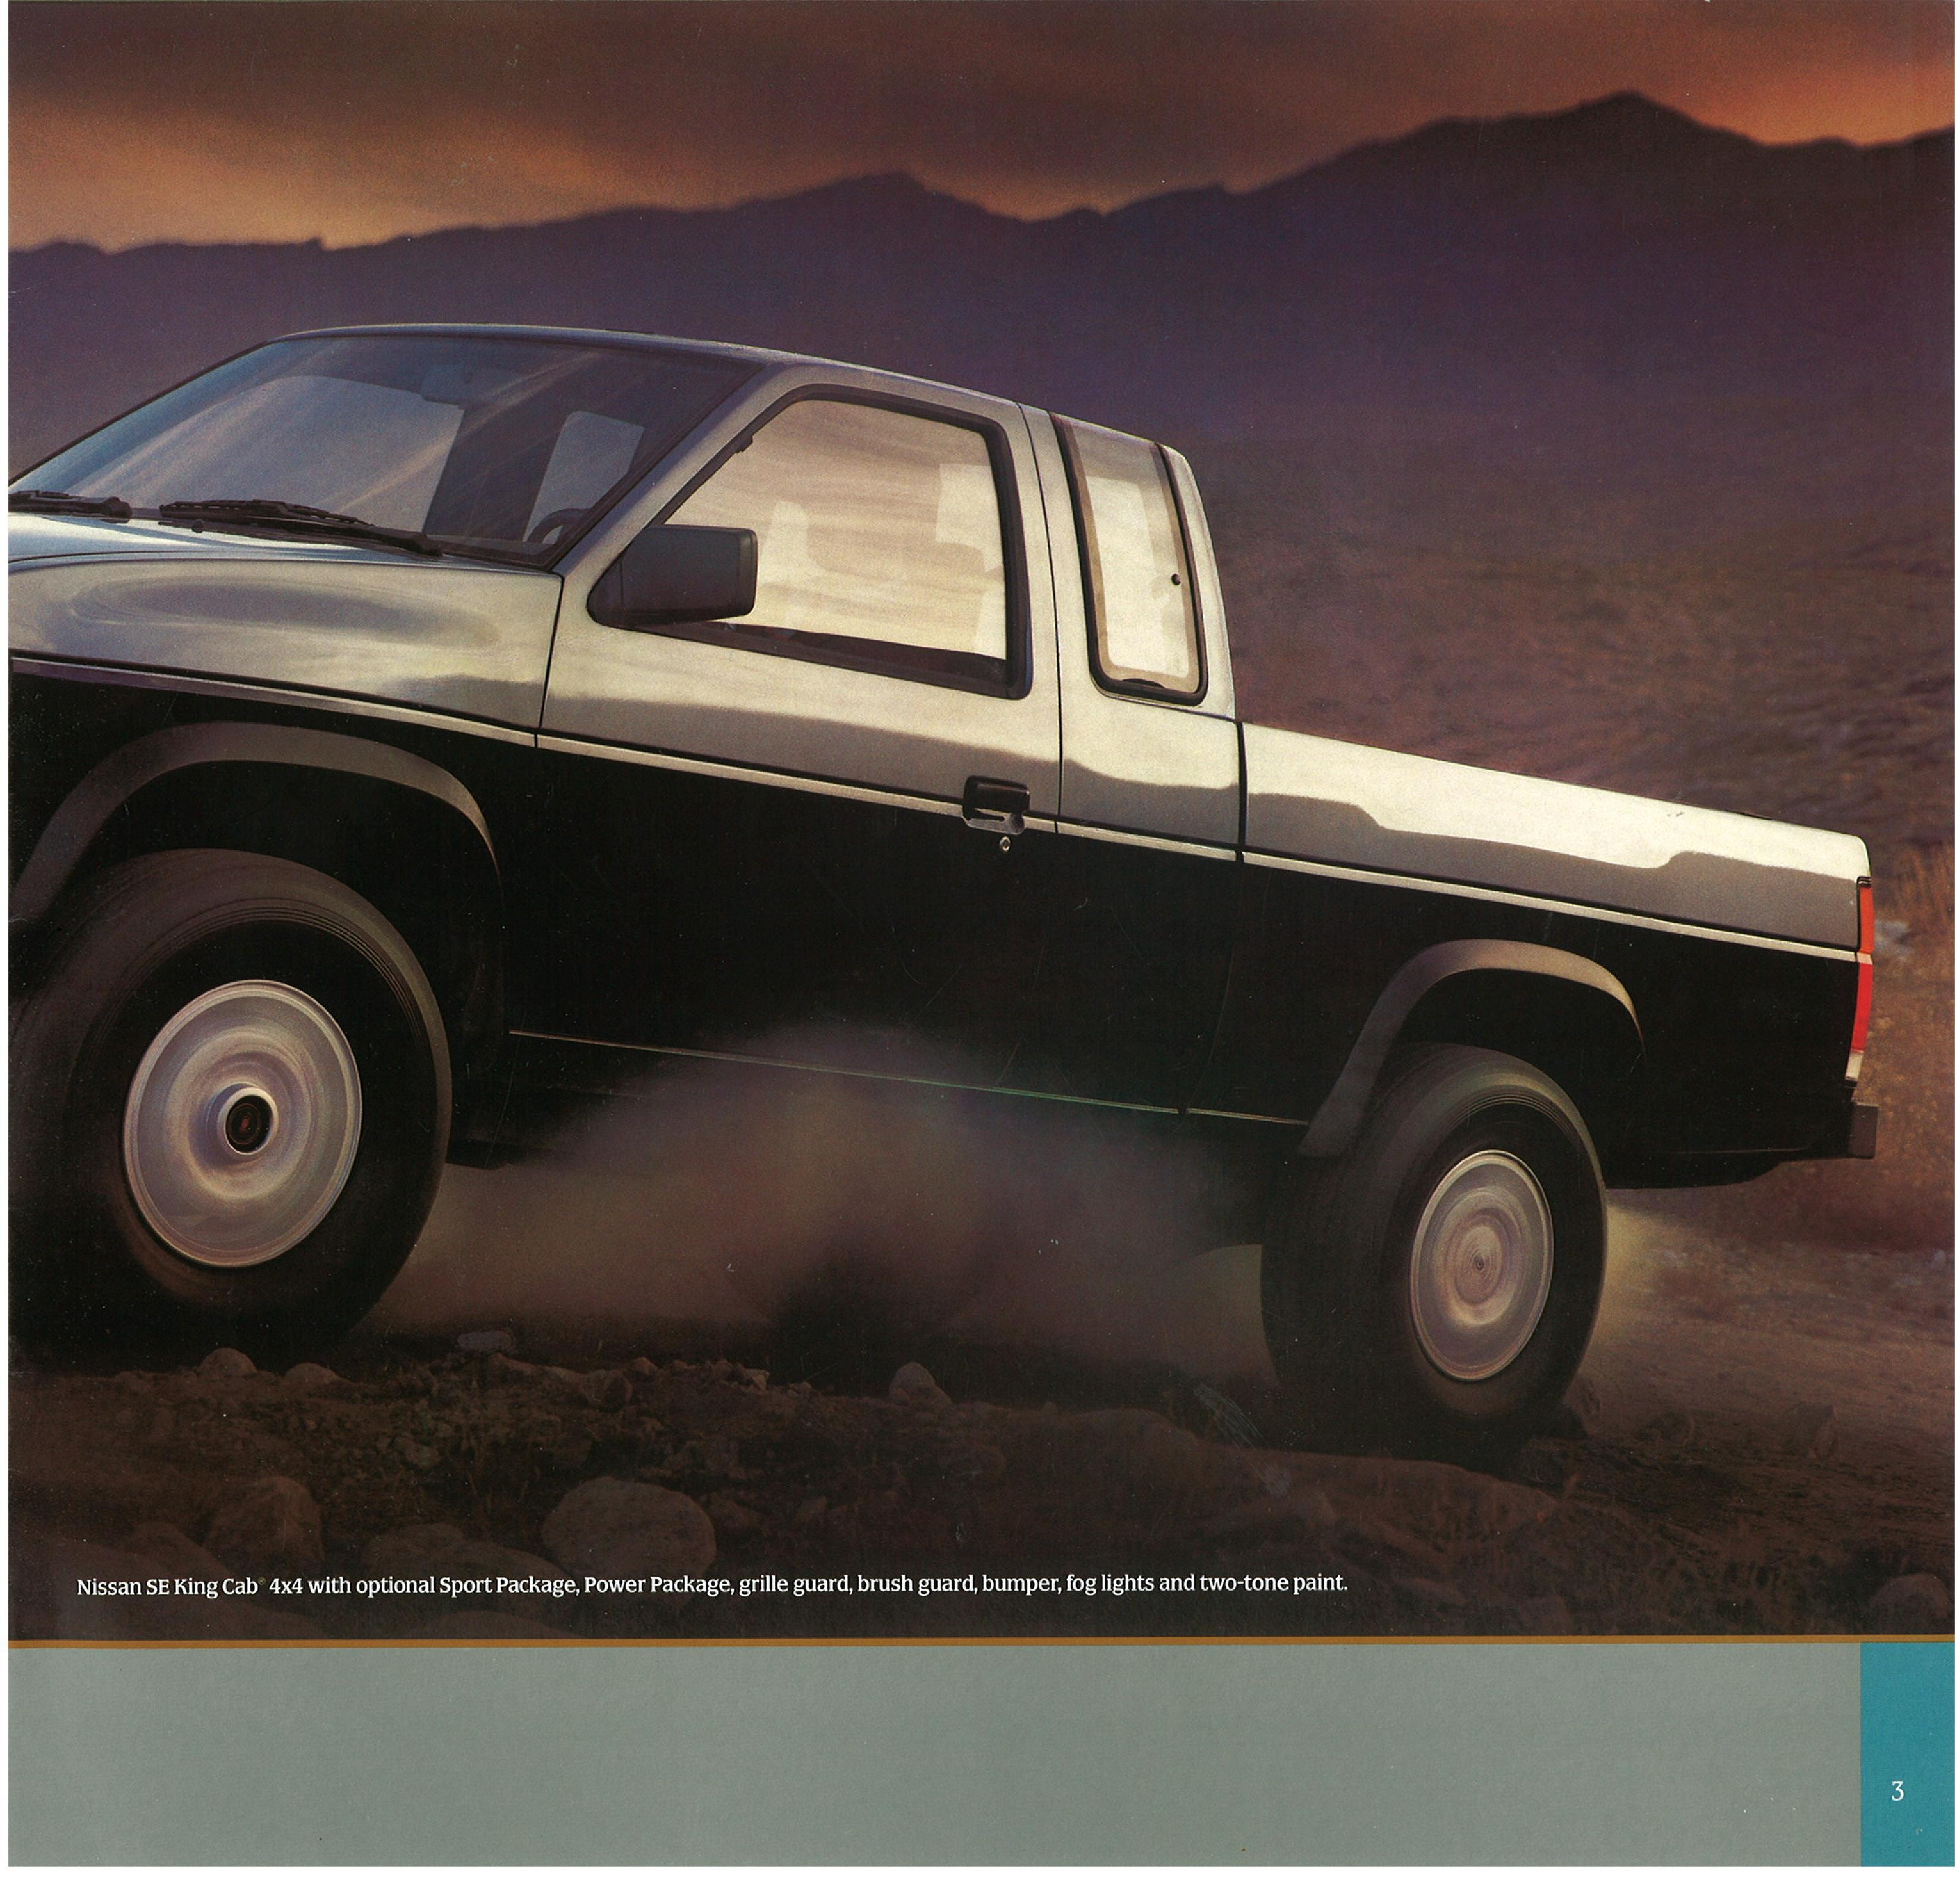 1987 Nissan Hardbody Truck D21 Dealer Brochure - US Market ...